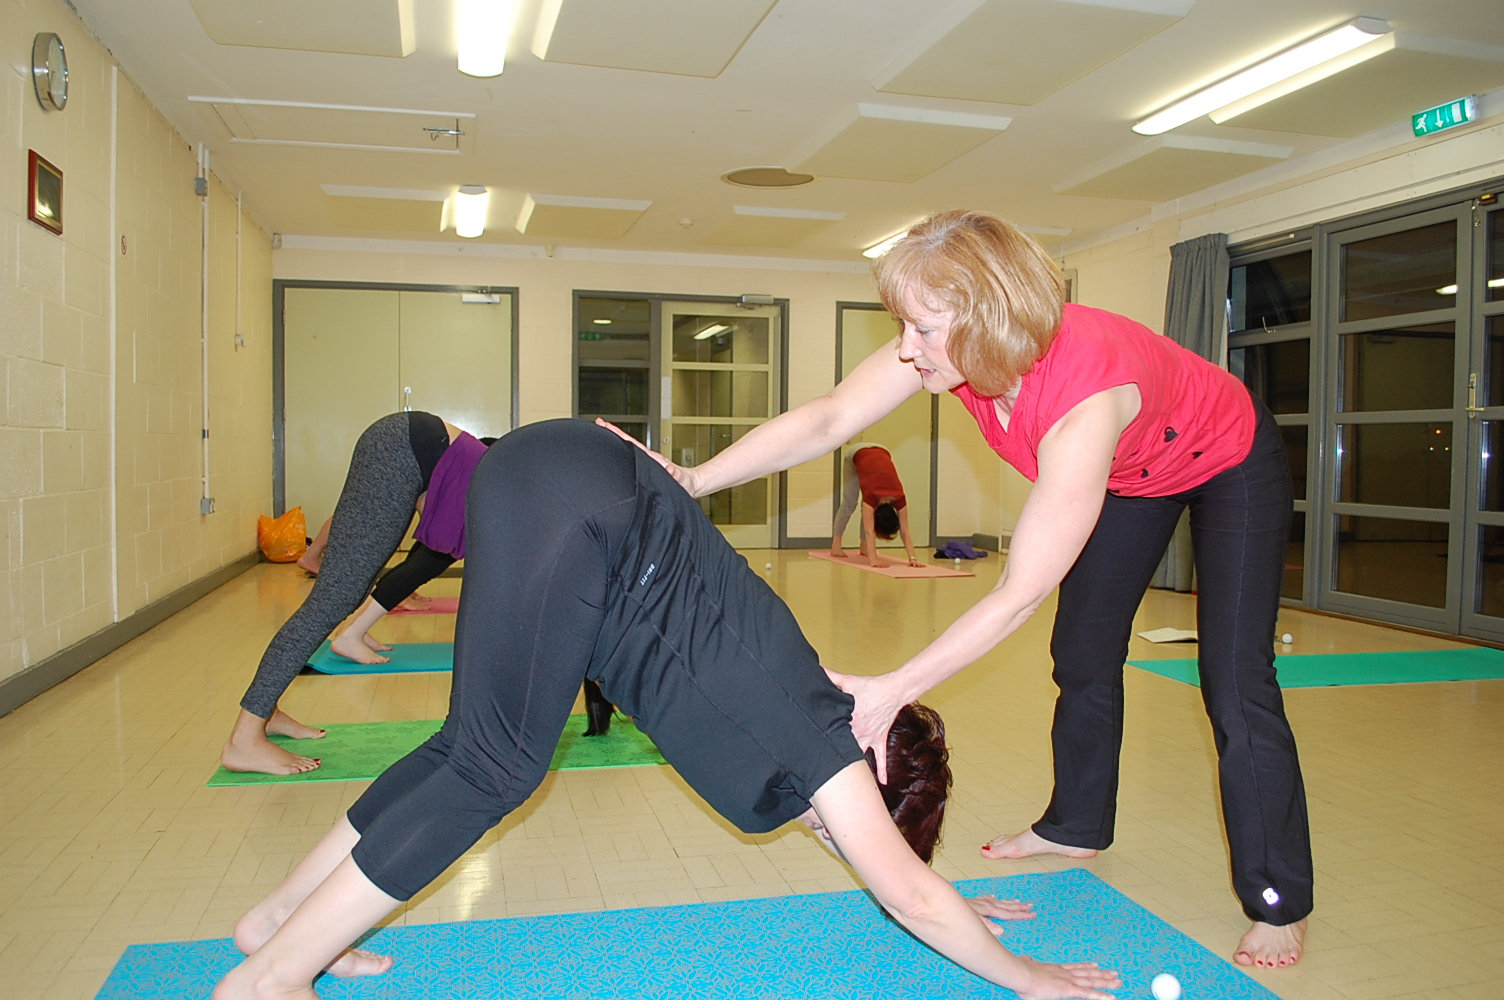 Online Friday Yoga Flow 3:30 - 4:30pm